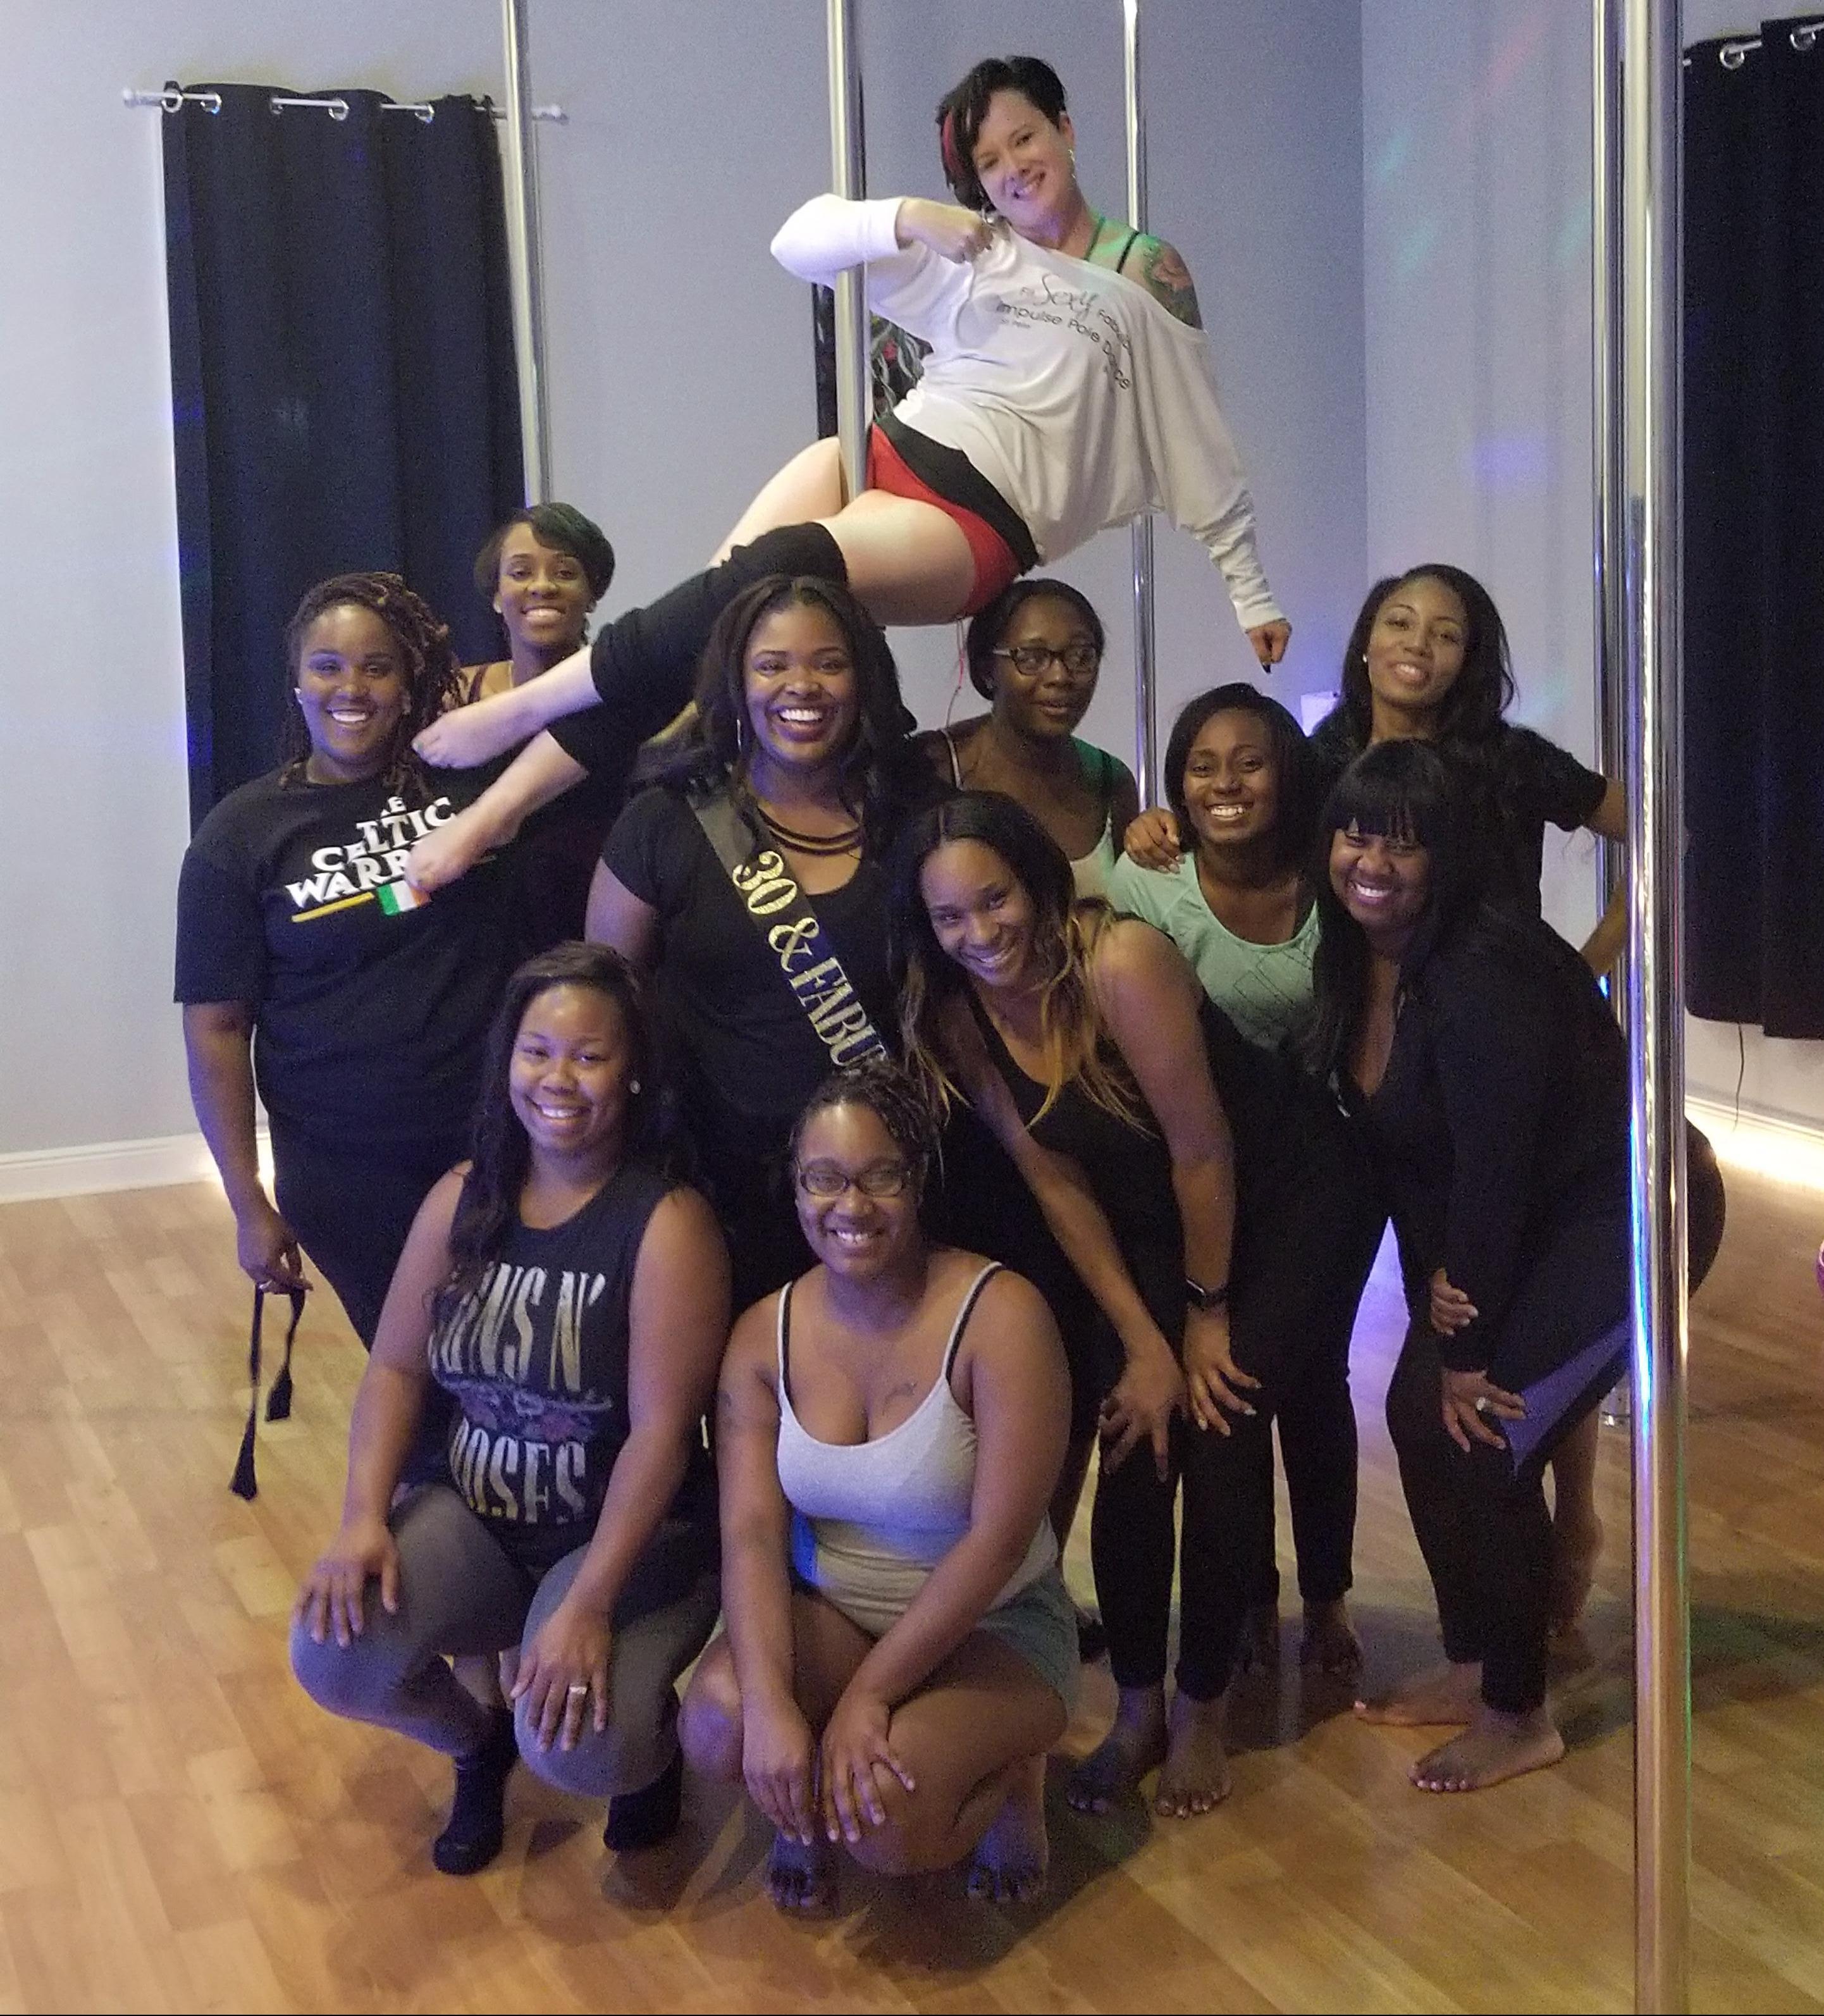 A very fun group at Impulse Pole Dance